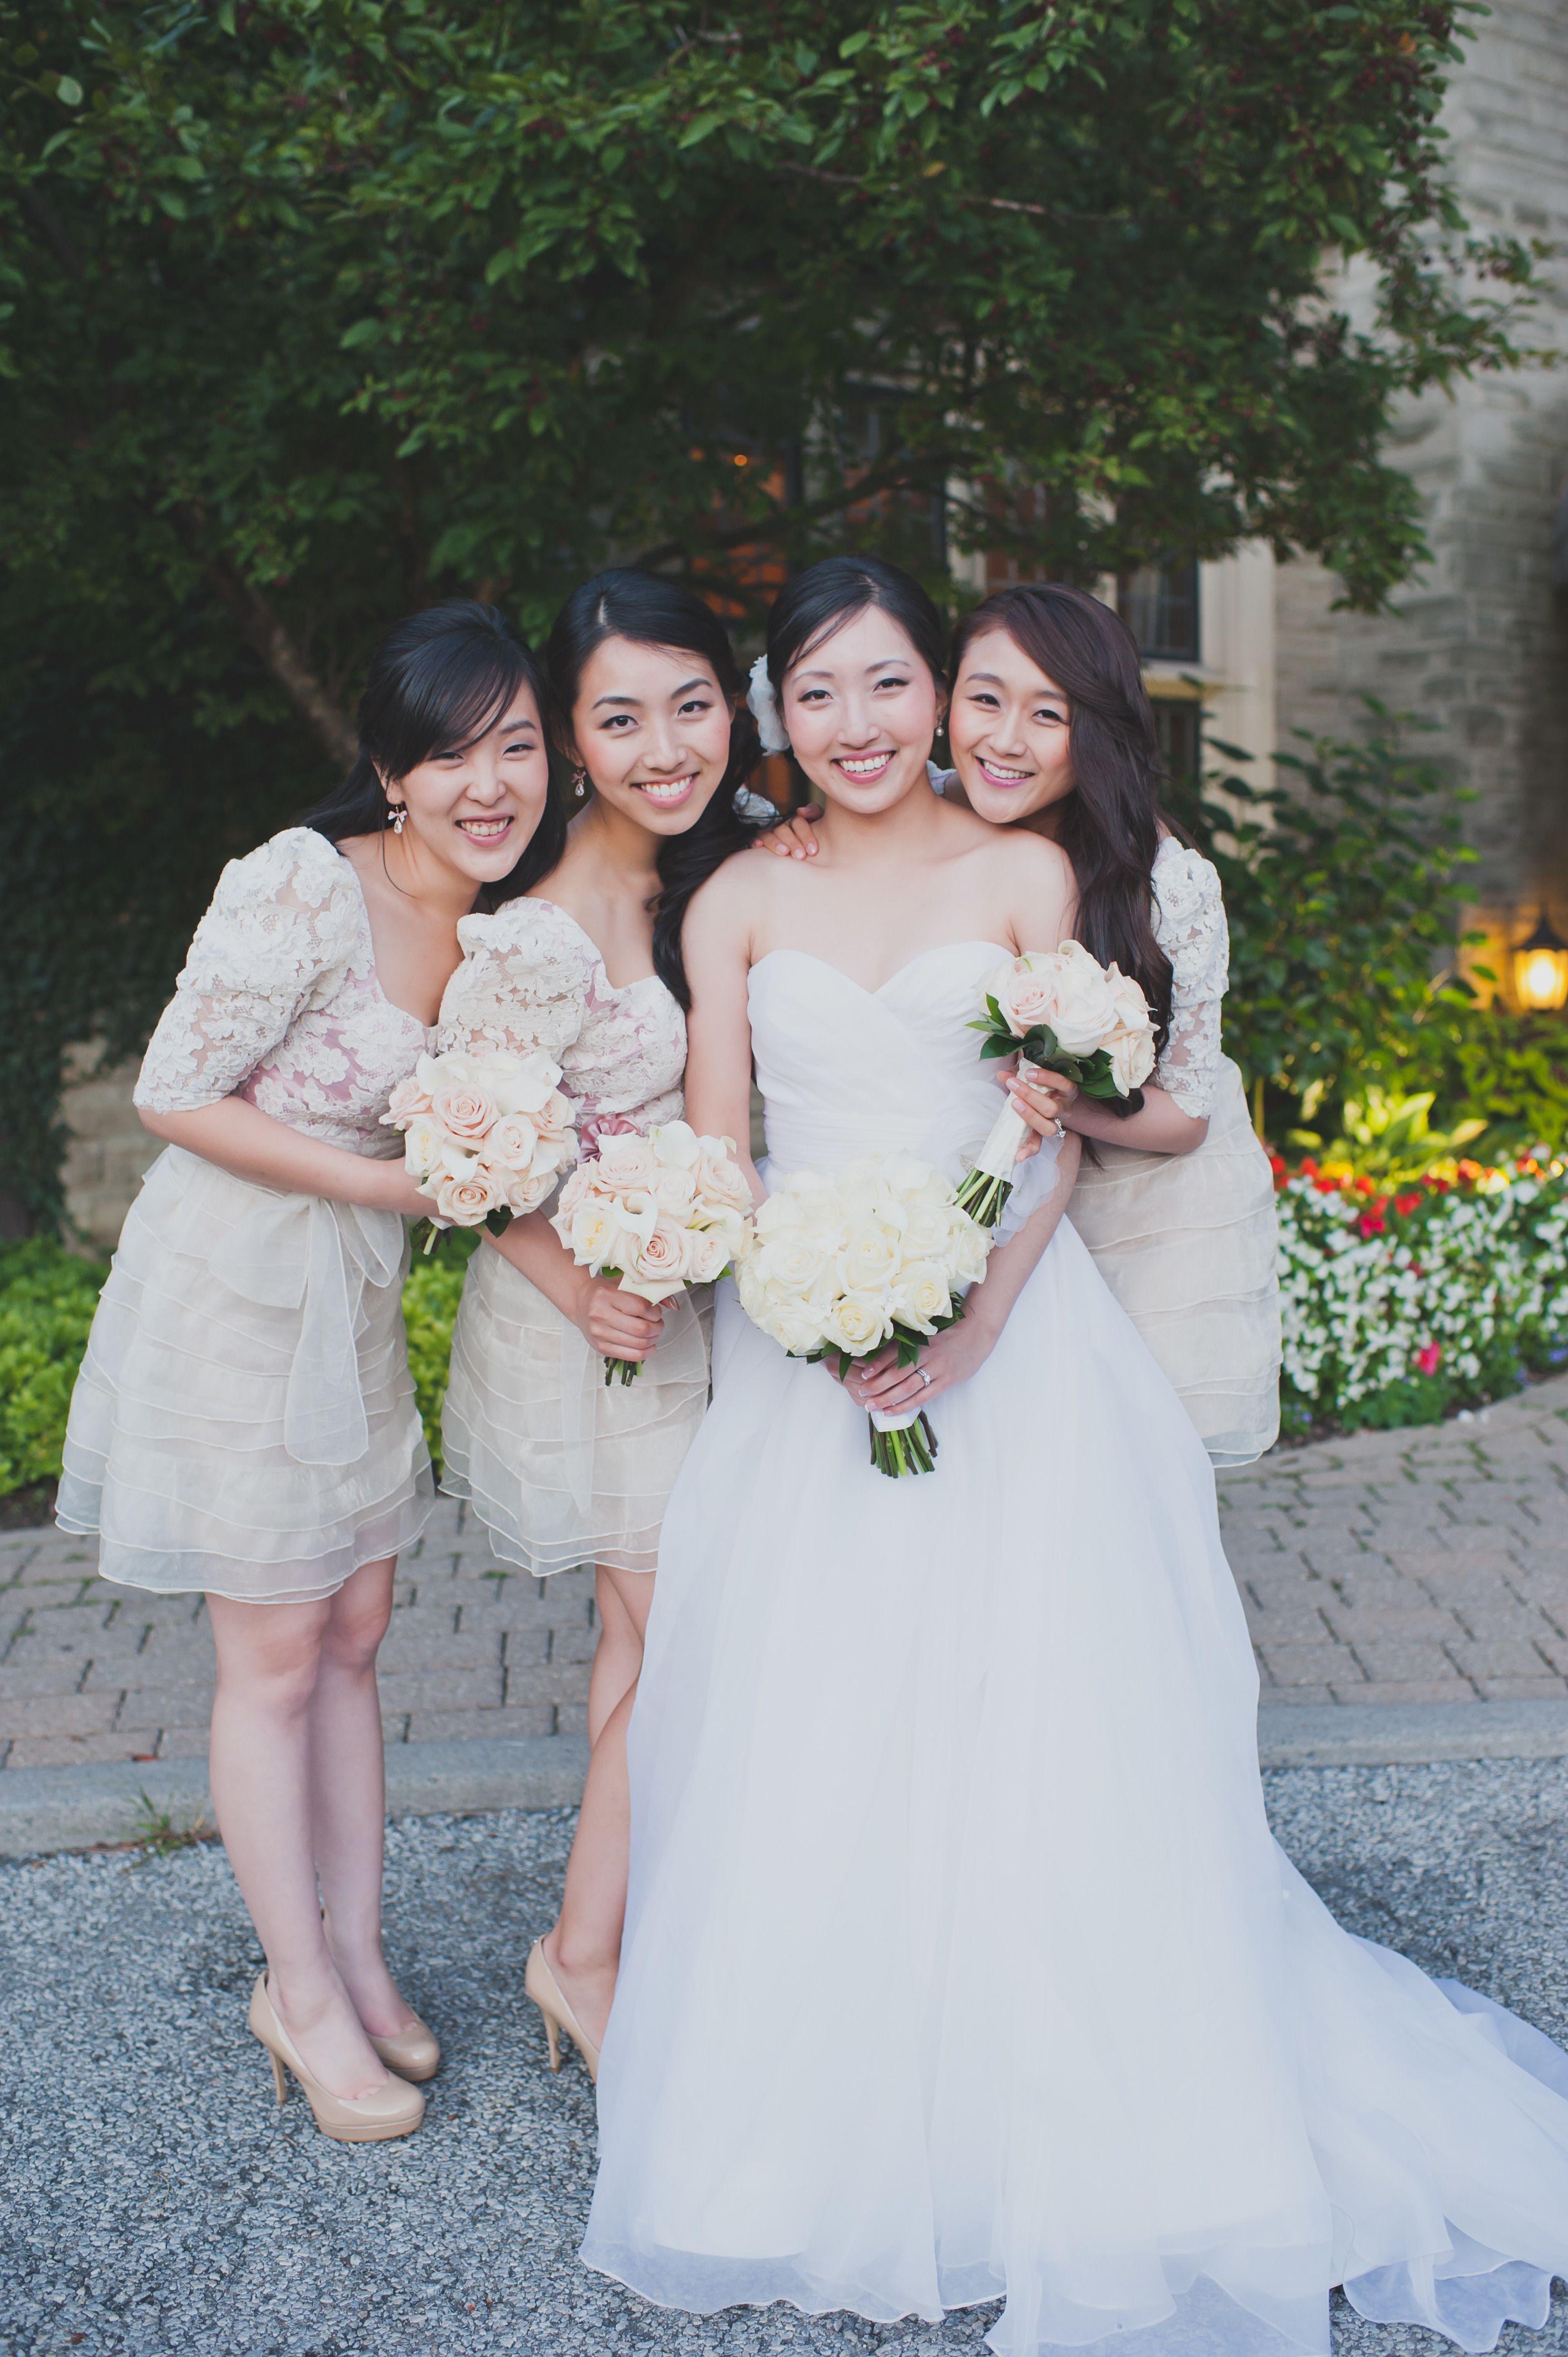 Toronto Wedding at Estates of Sunnybrook from Illusions